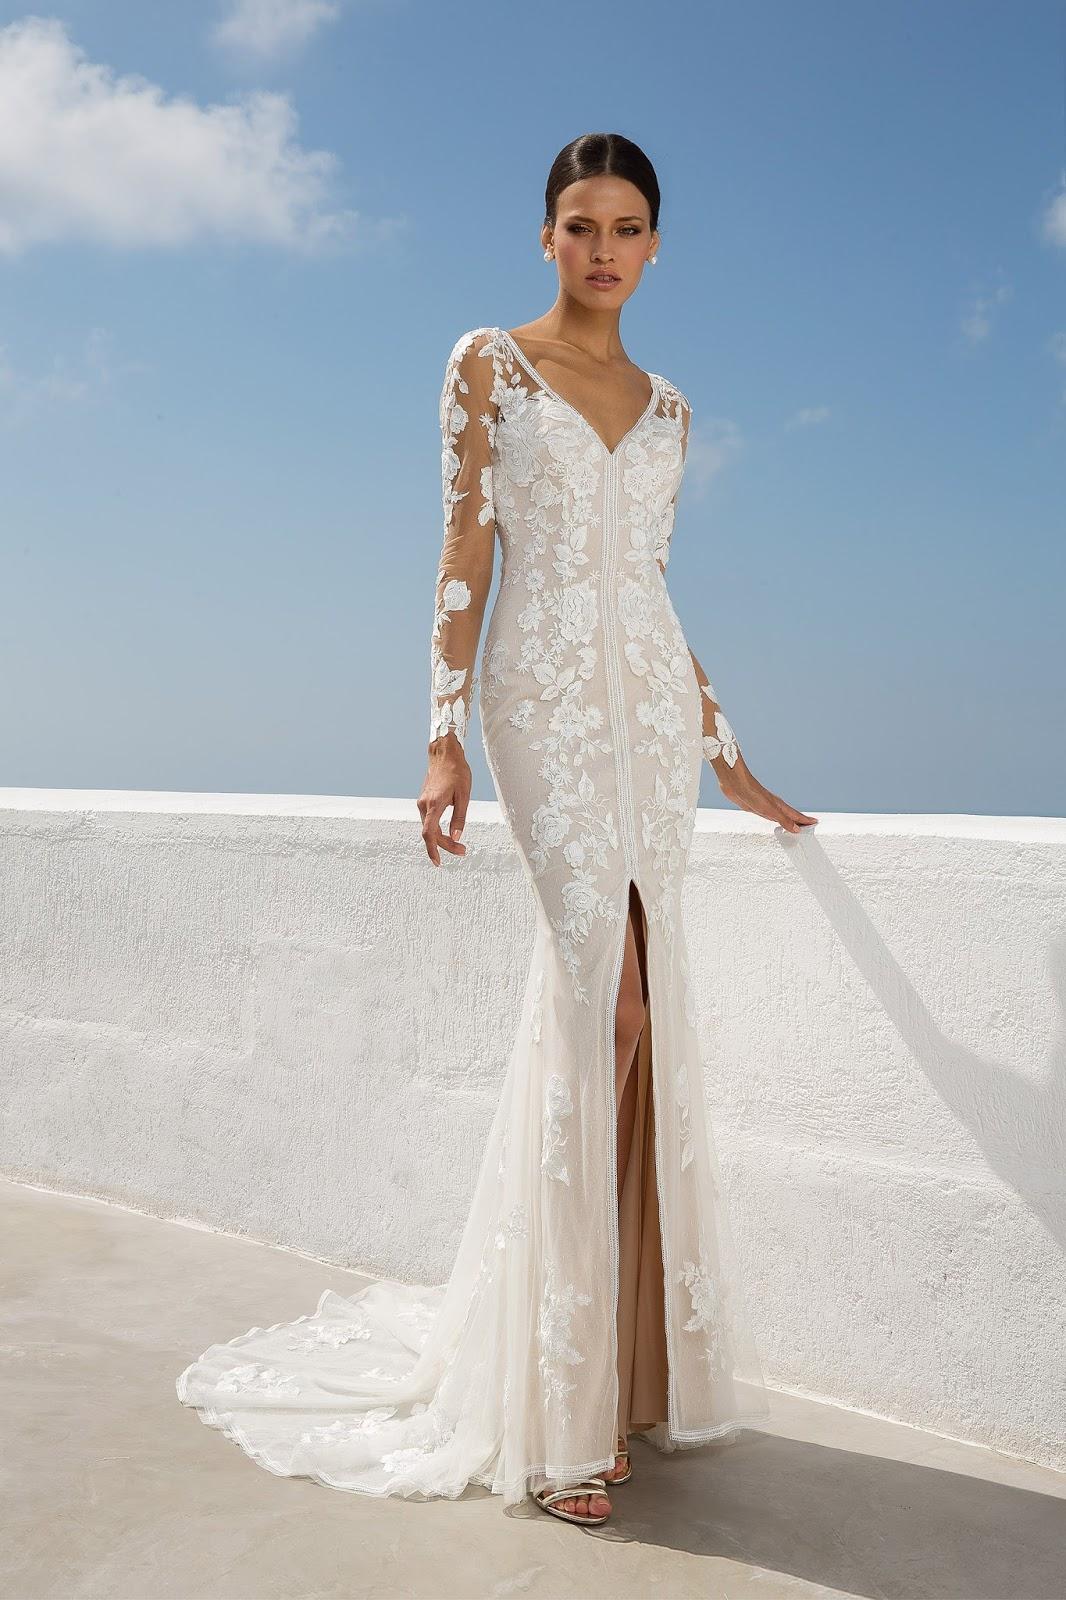 Comfortable Preppy Wedding Dresses Images - Wedding Ideas ...